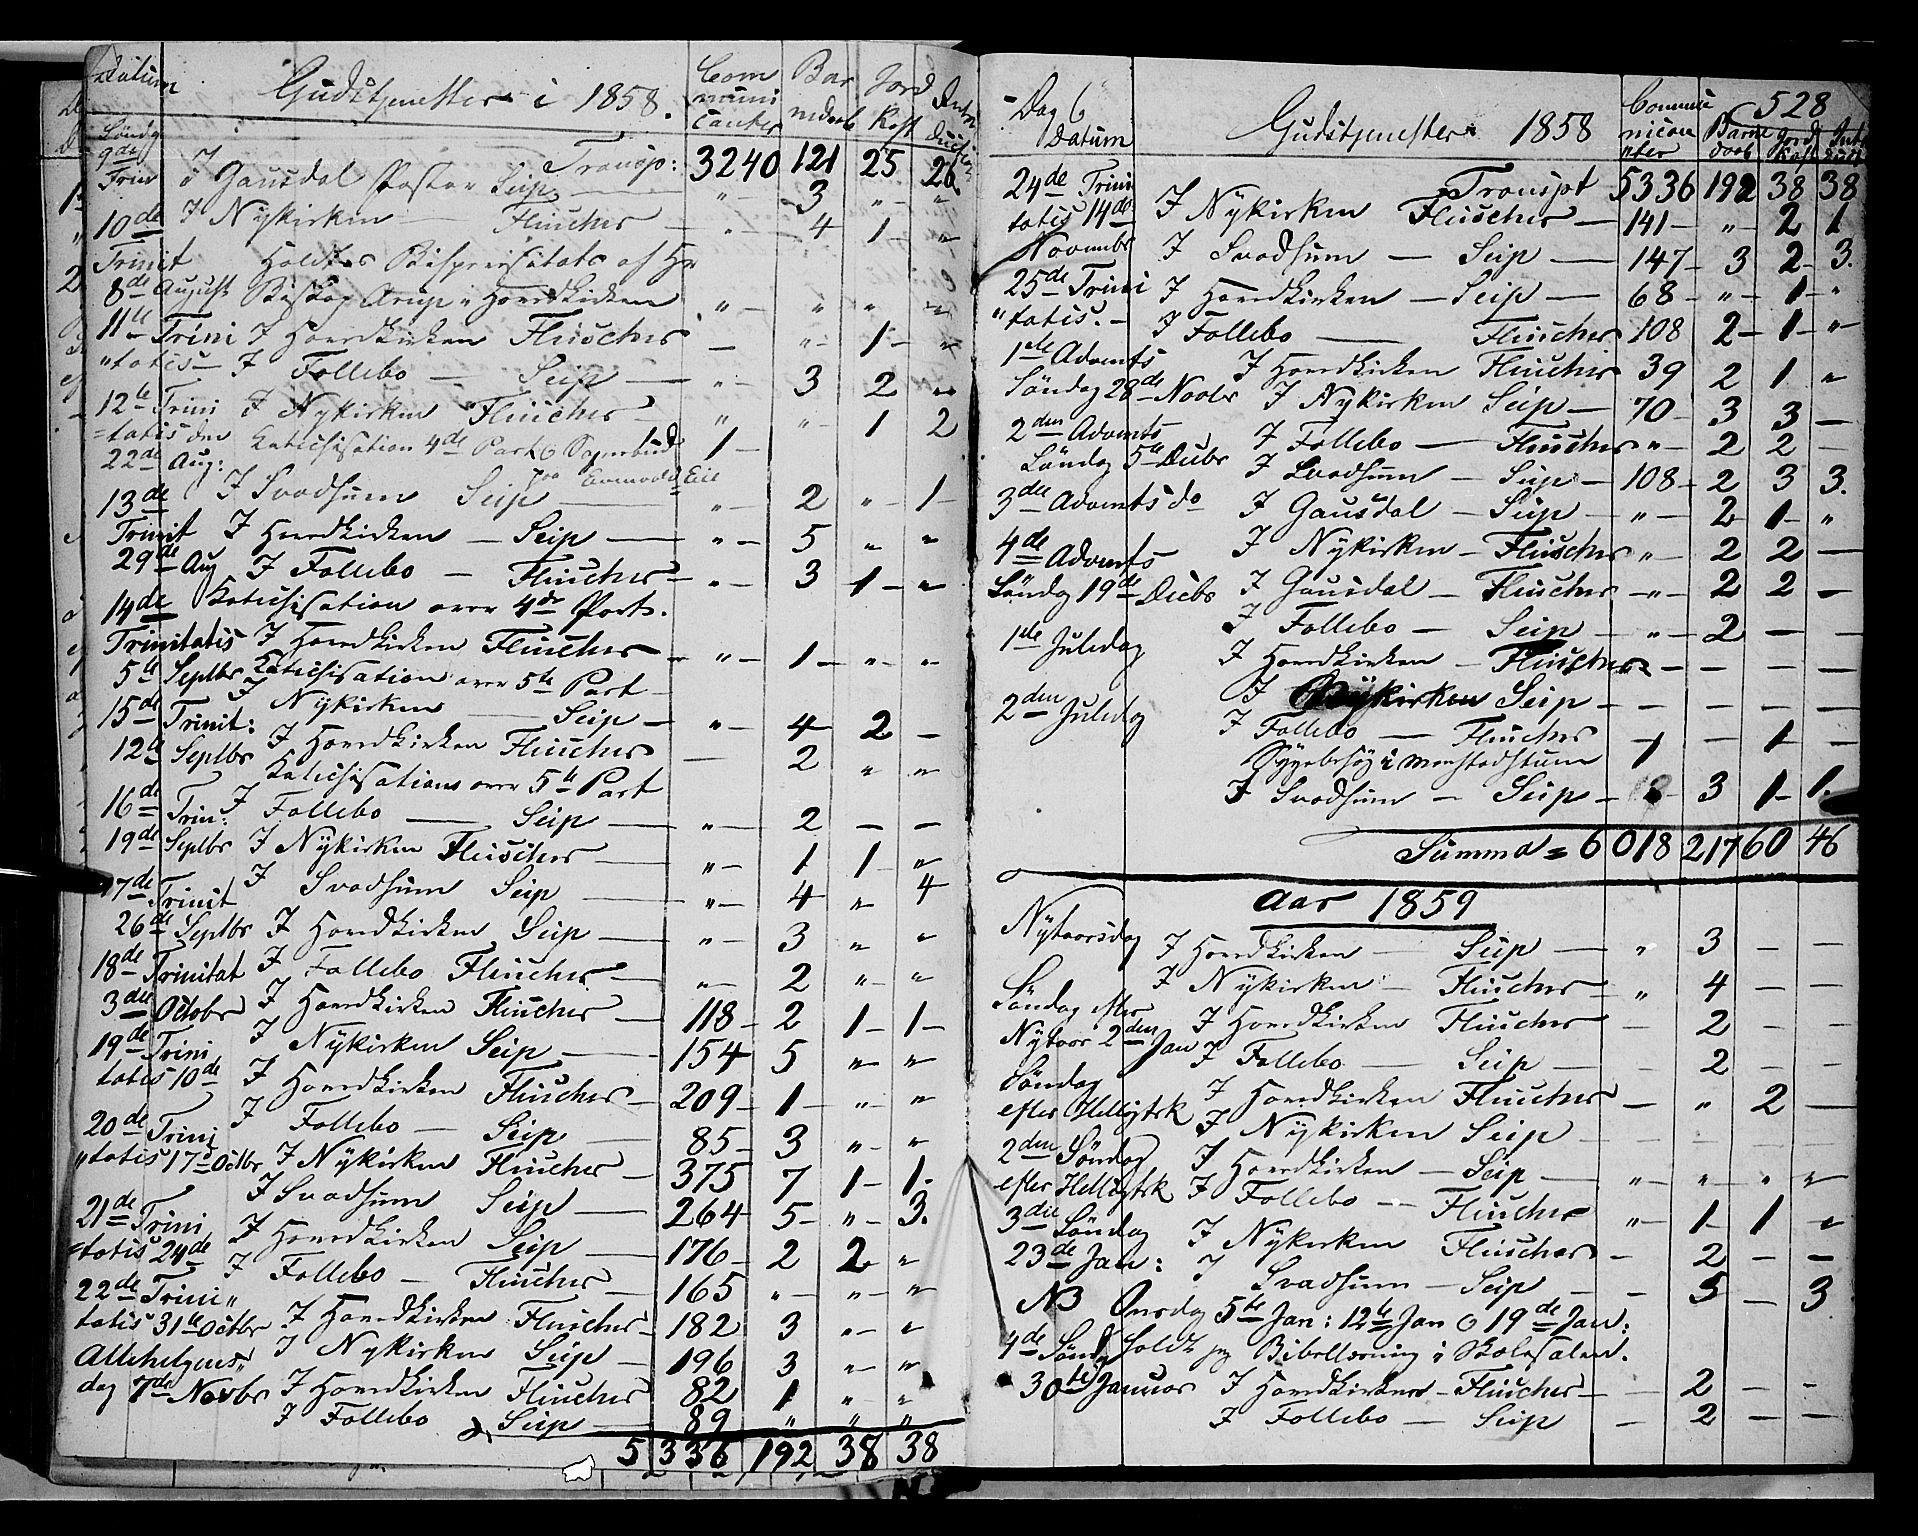 SAH, Gausdal prestekontor, Ministerialbok nr. 8, 1850-1861, s. 528